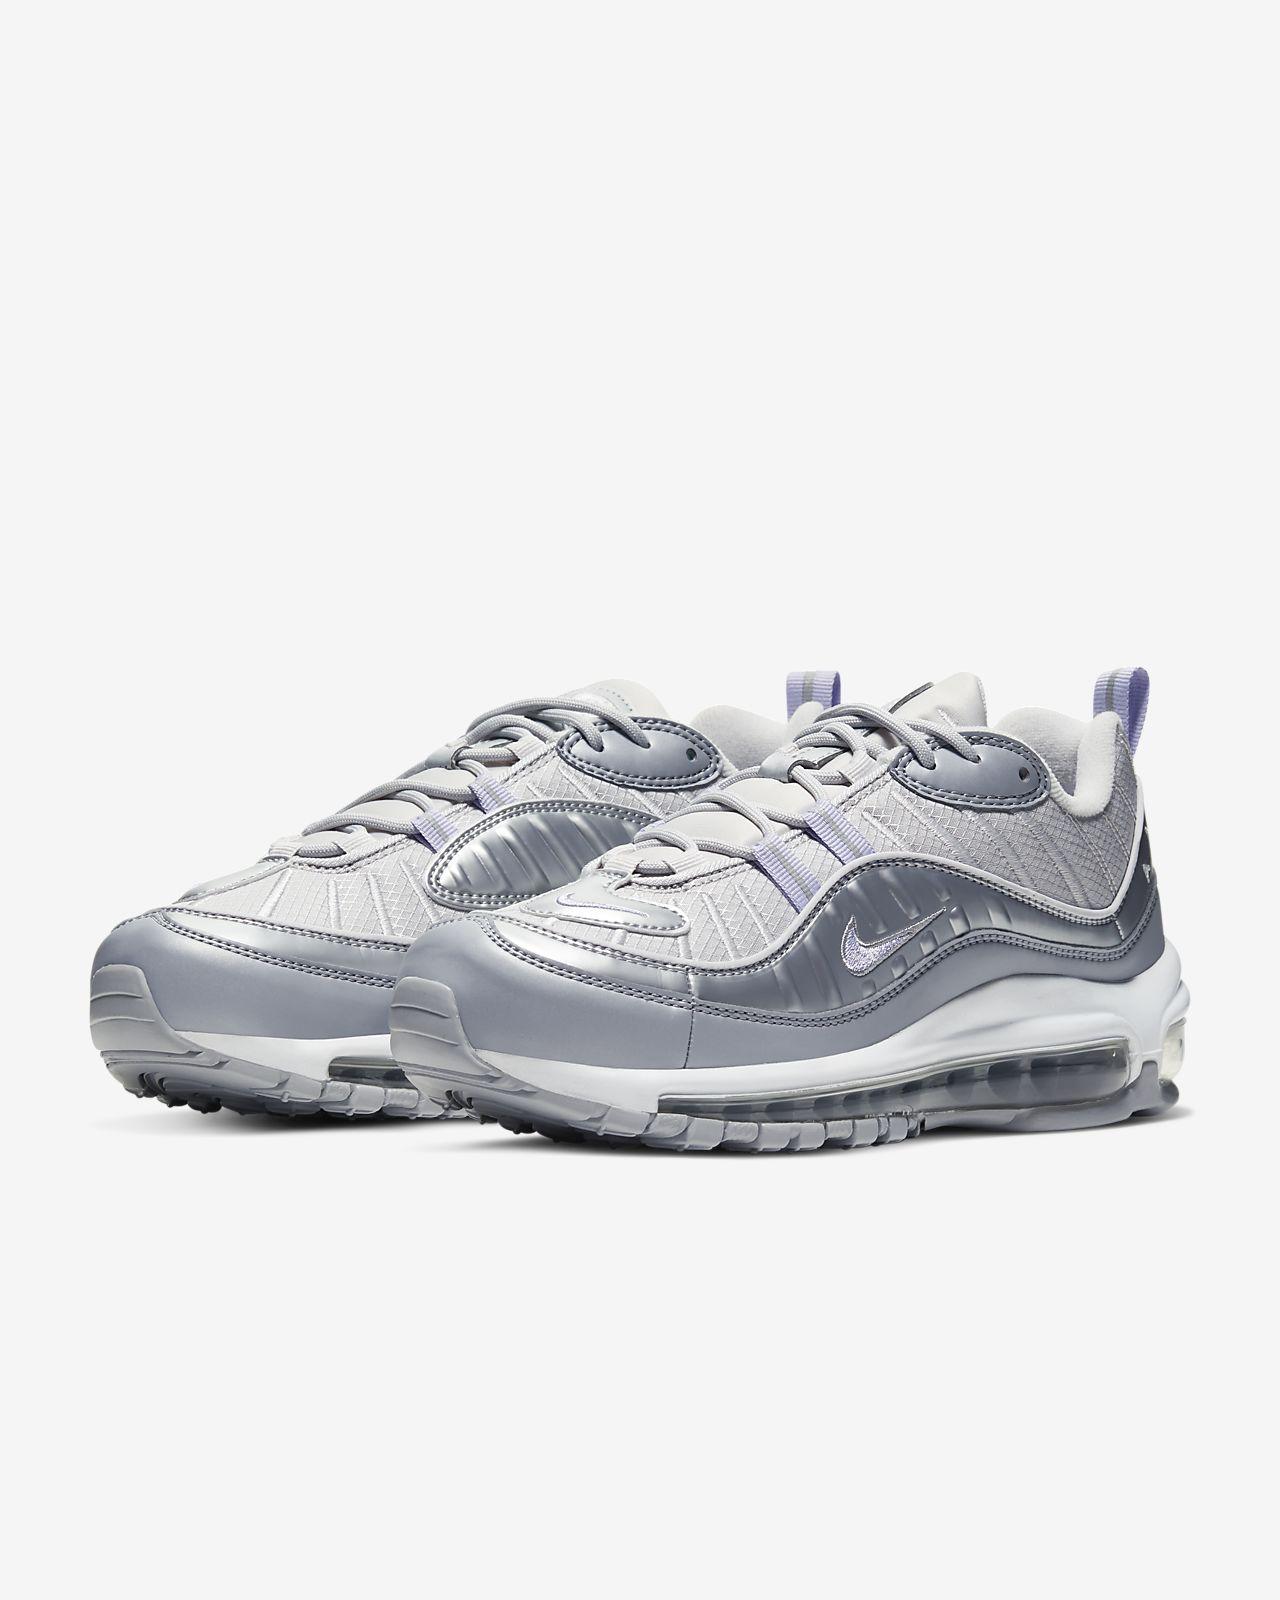 Nike Air Max 98 shoes white purple